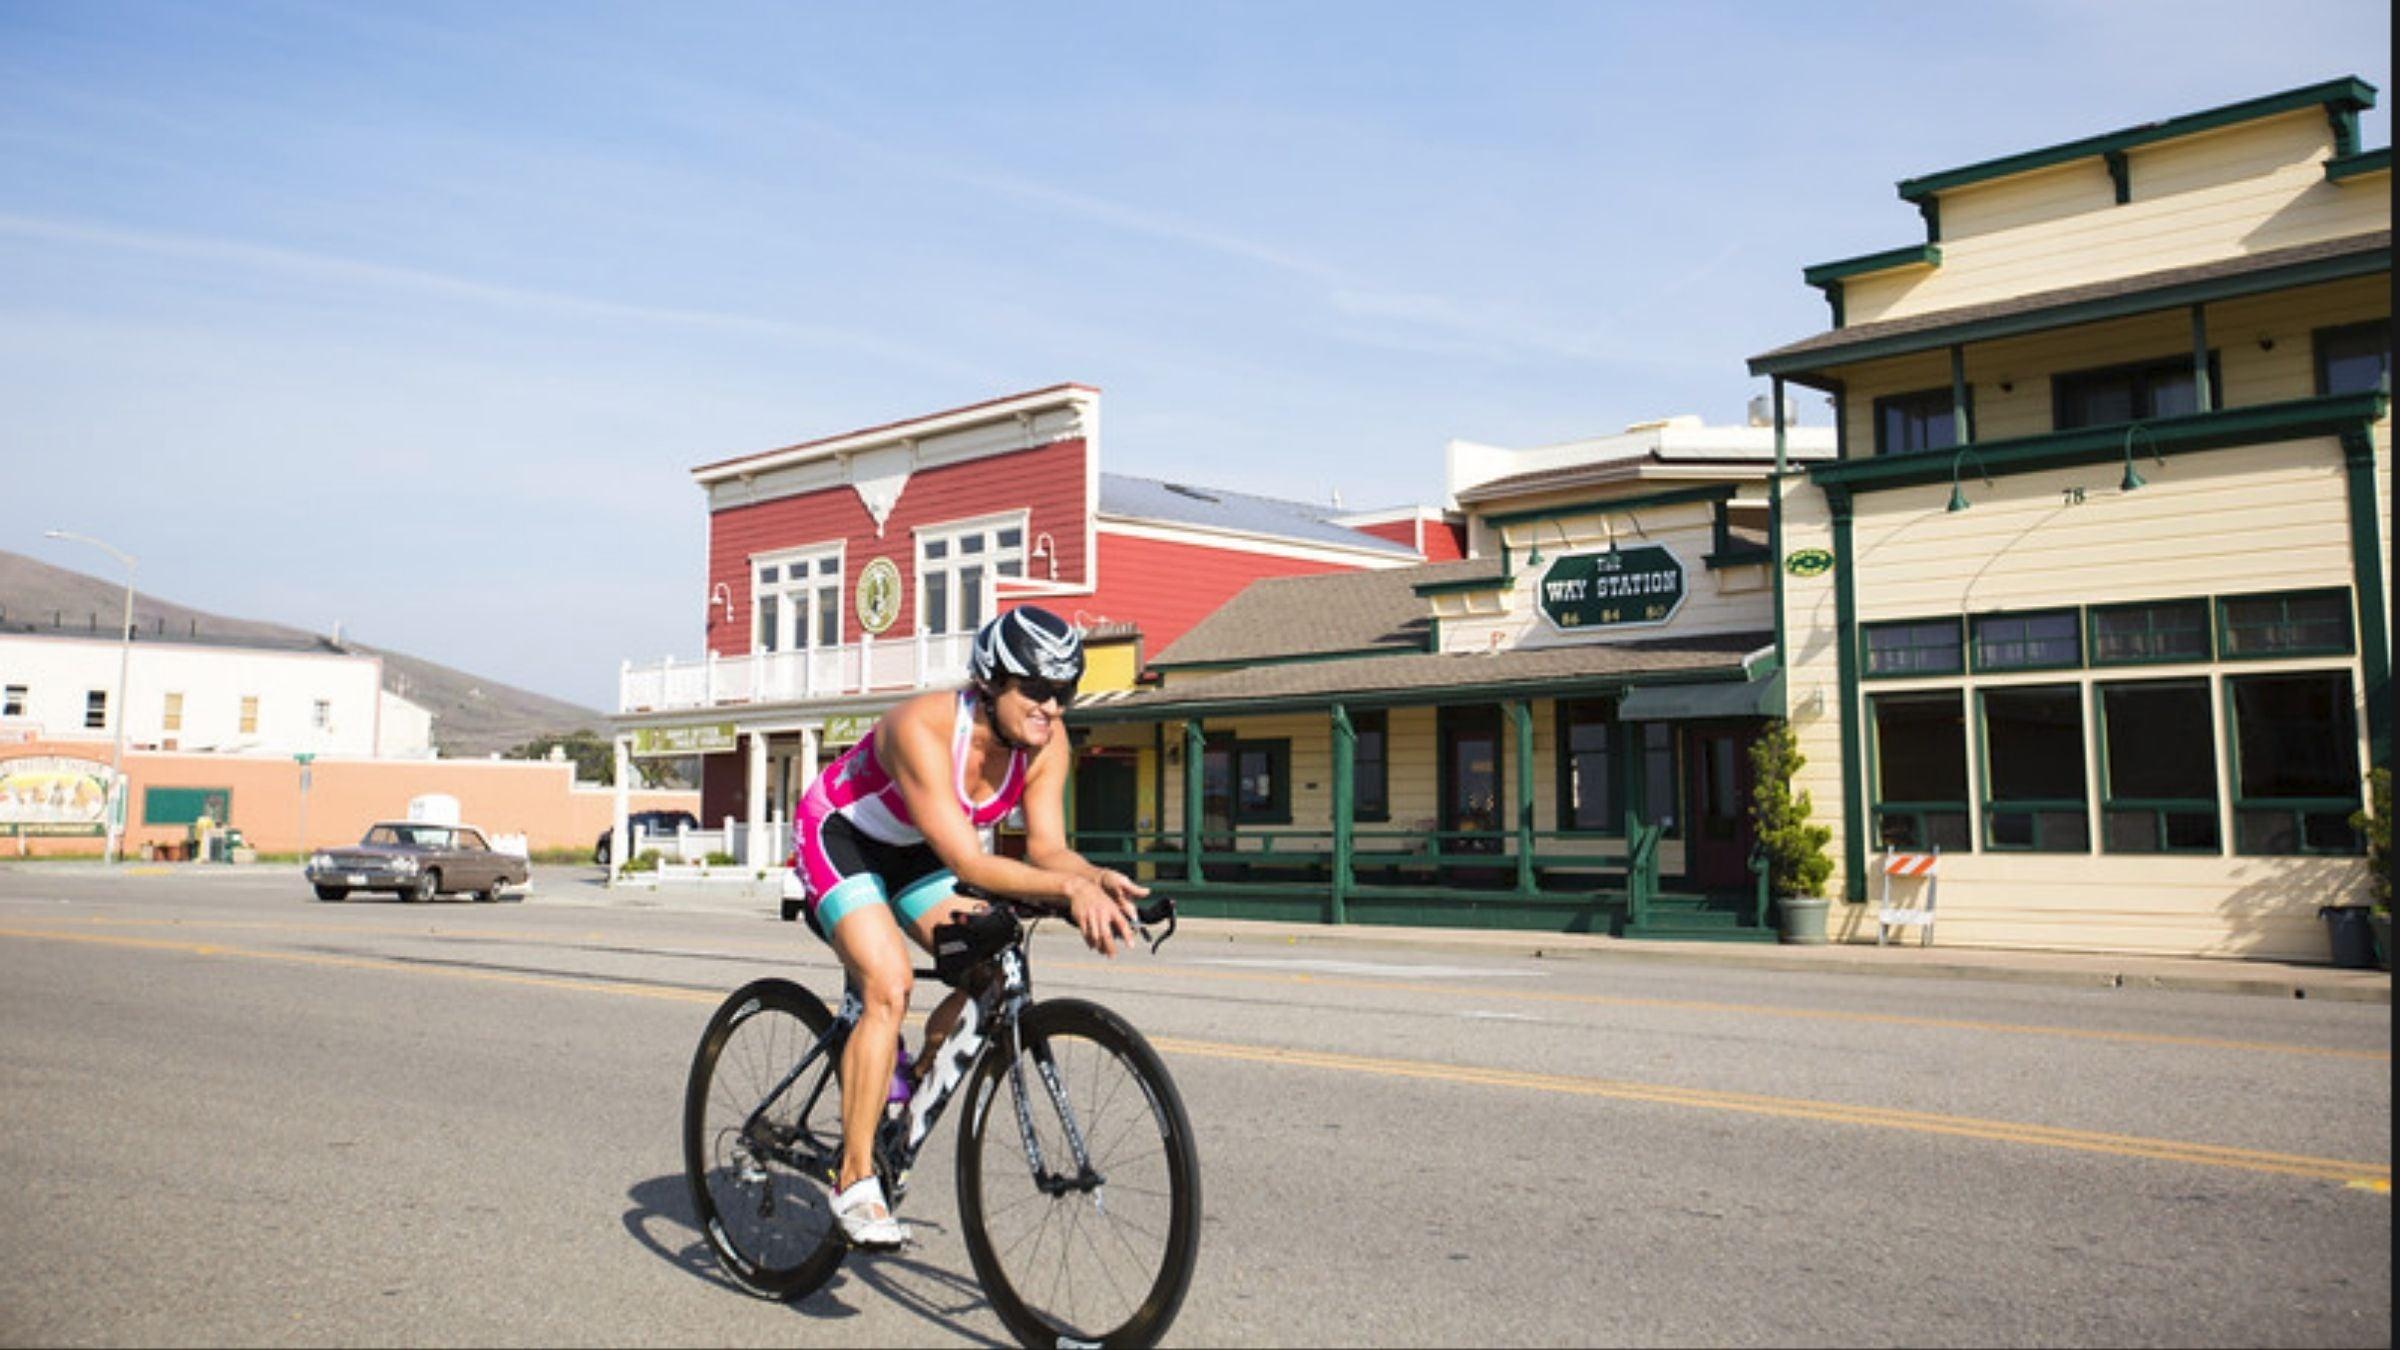 A woman on a triathlon bike smiles as she rides through the Morro Bay Triathlon.